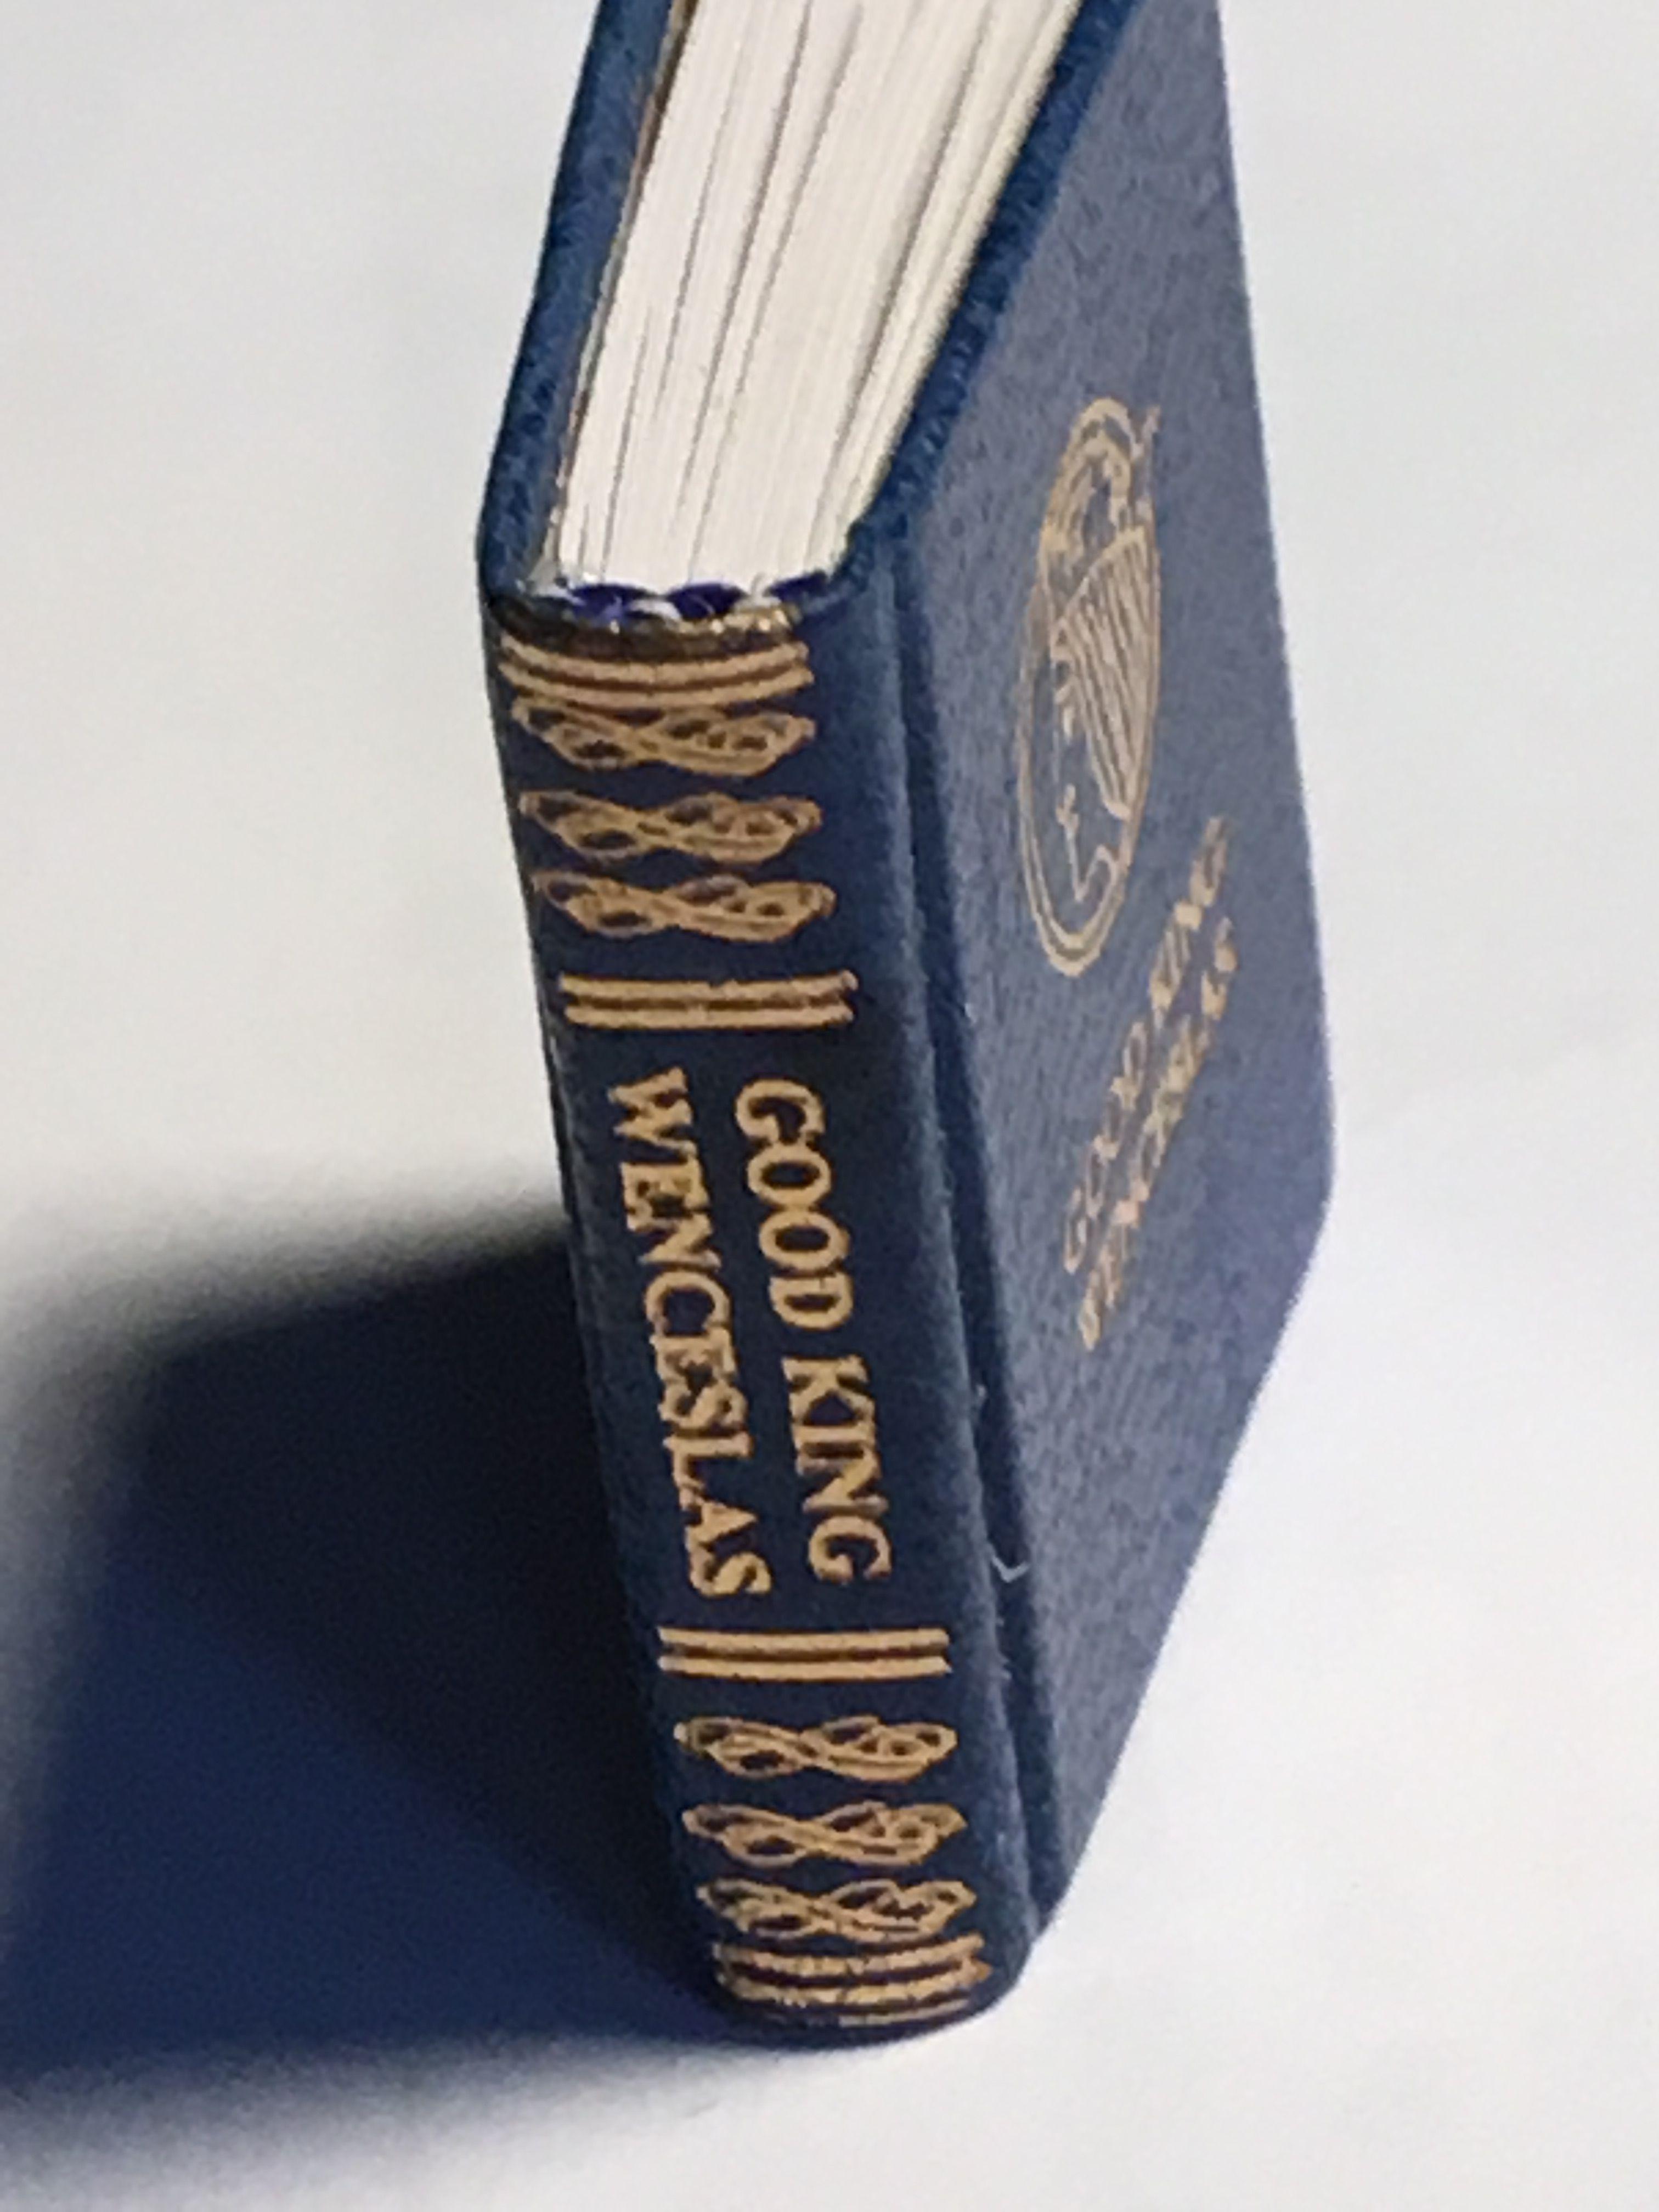 Barbara Raheb Pennyweight Press Igma Fellow Good King Wenceslas By John Mason Neale Blue Leather Cover Stampe Leather Cover Blue Leather Hand Coloring